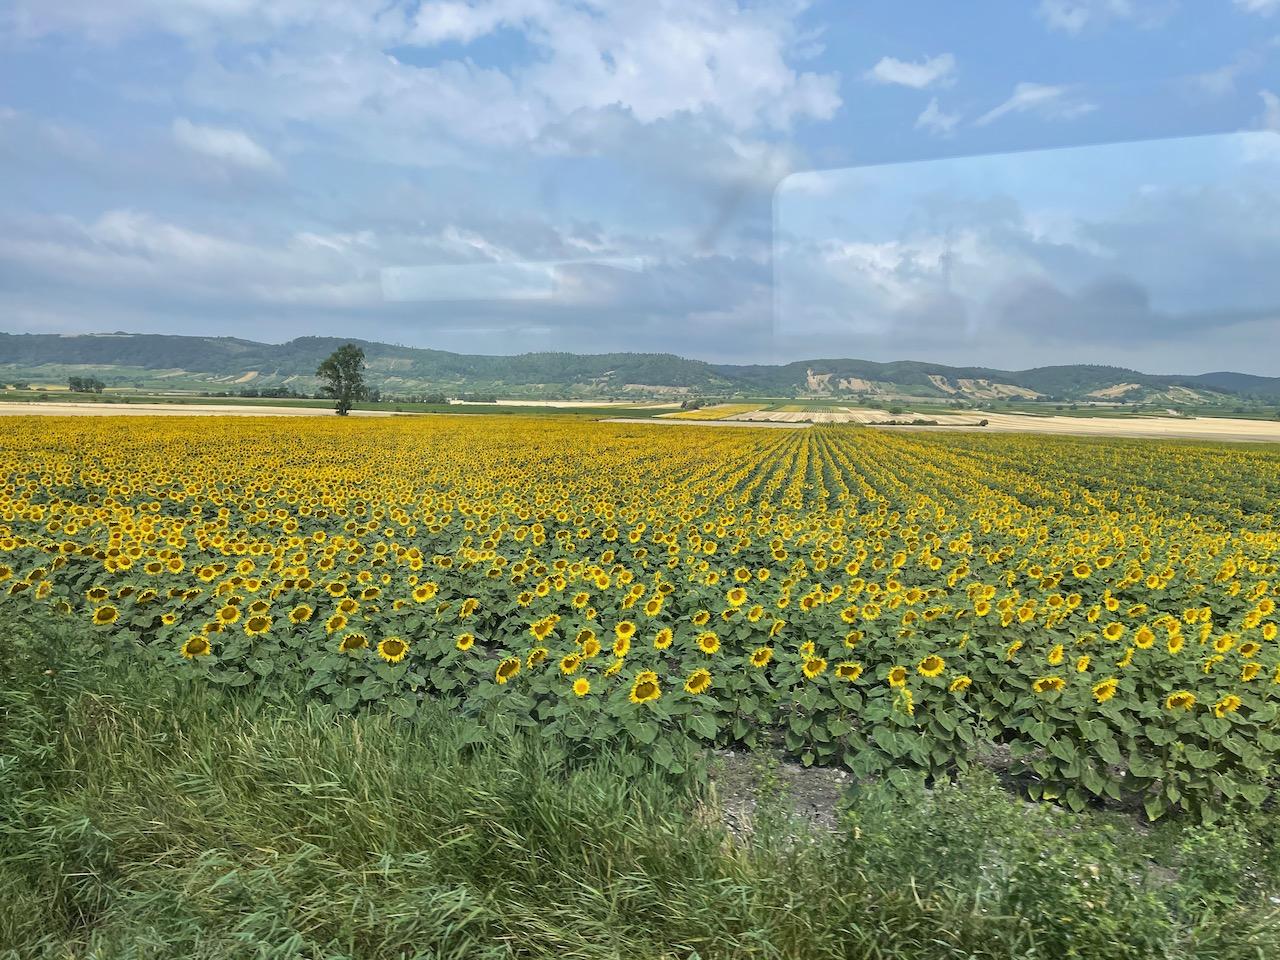 Campo de girassóis na Áustria